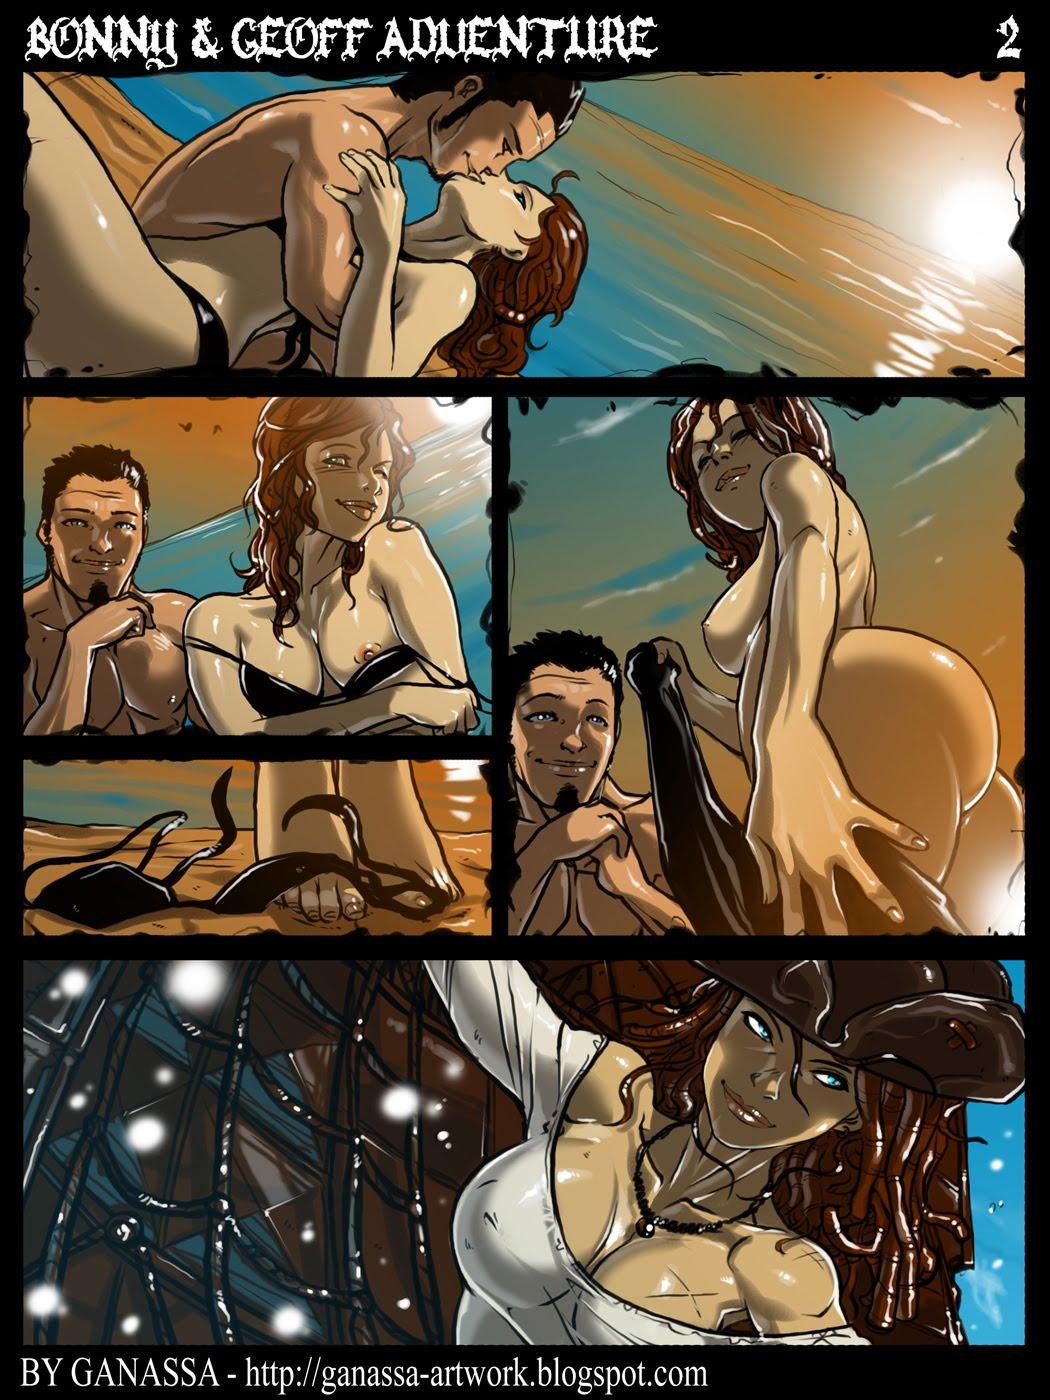 Assassin s creed cartoon sex picture cartoon pic